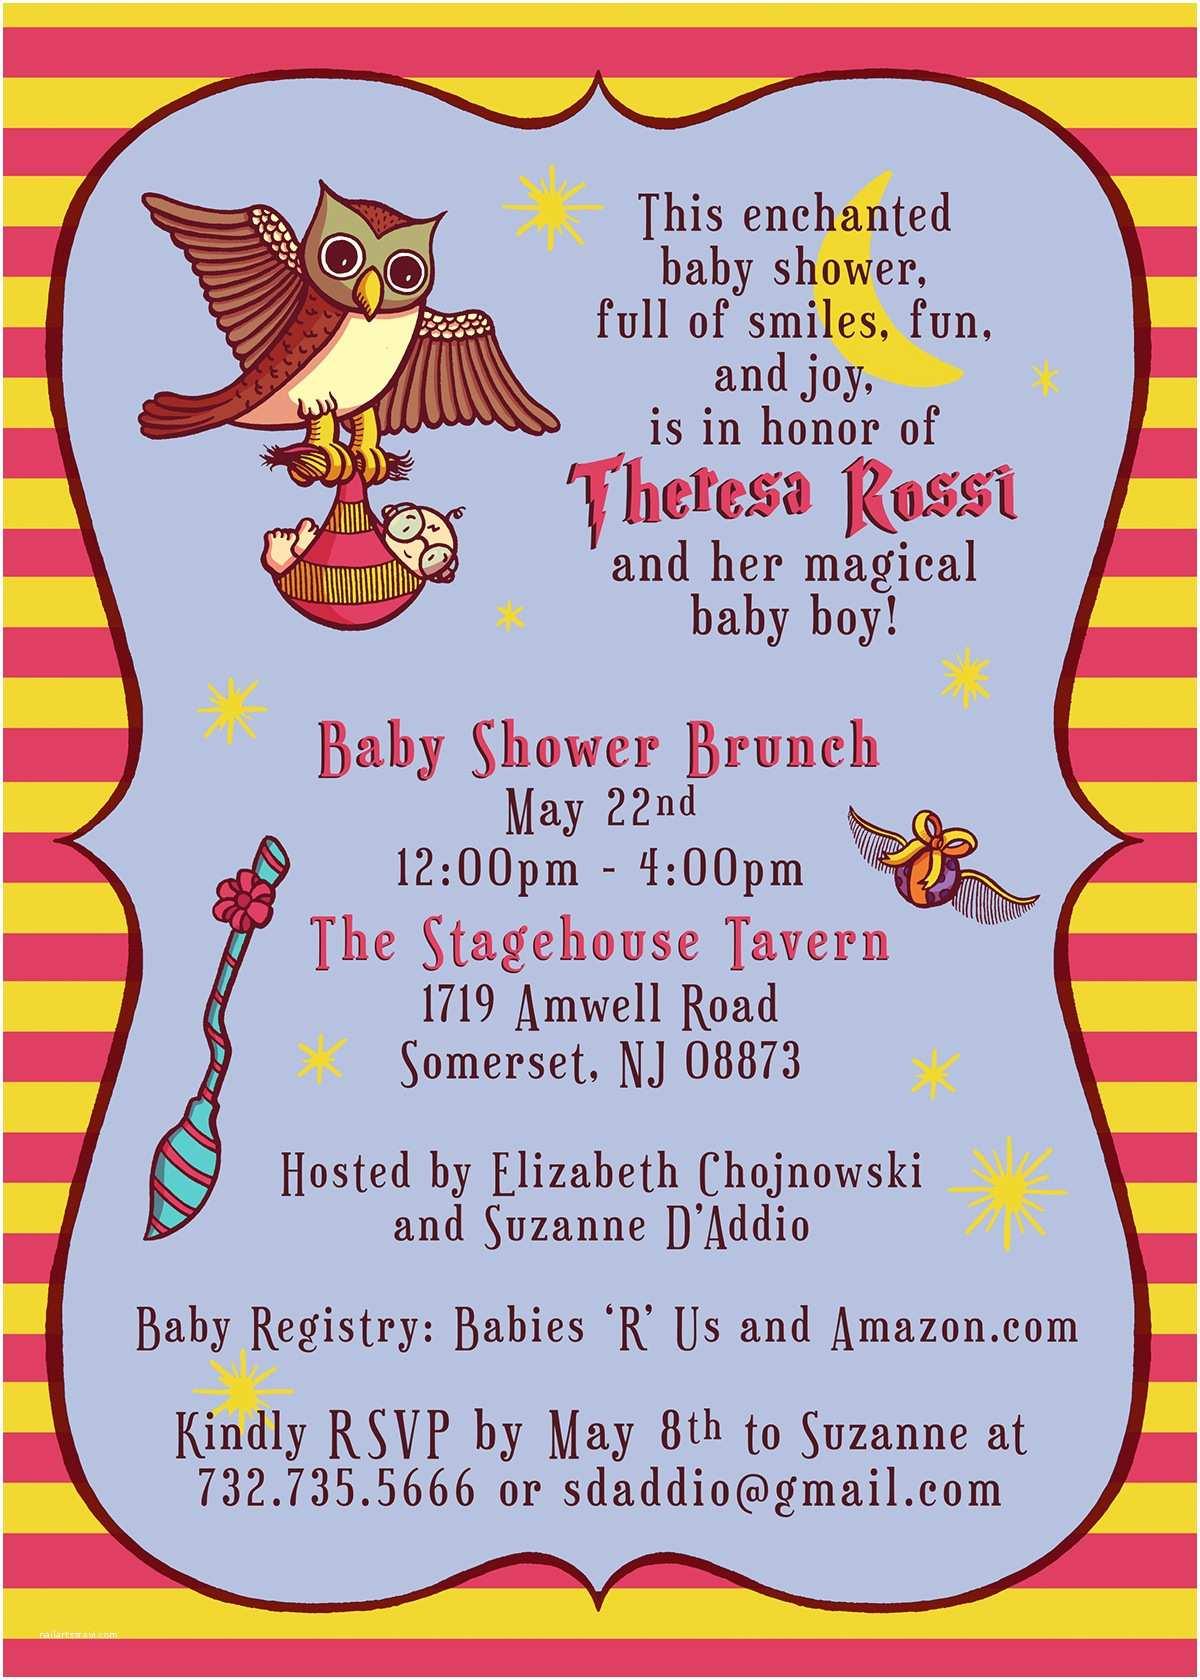 Harry Potter Baby Shower Invitations Harry Potter Baby Shower Invitation On Behance